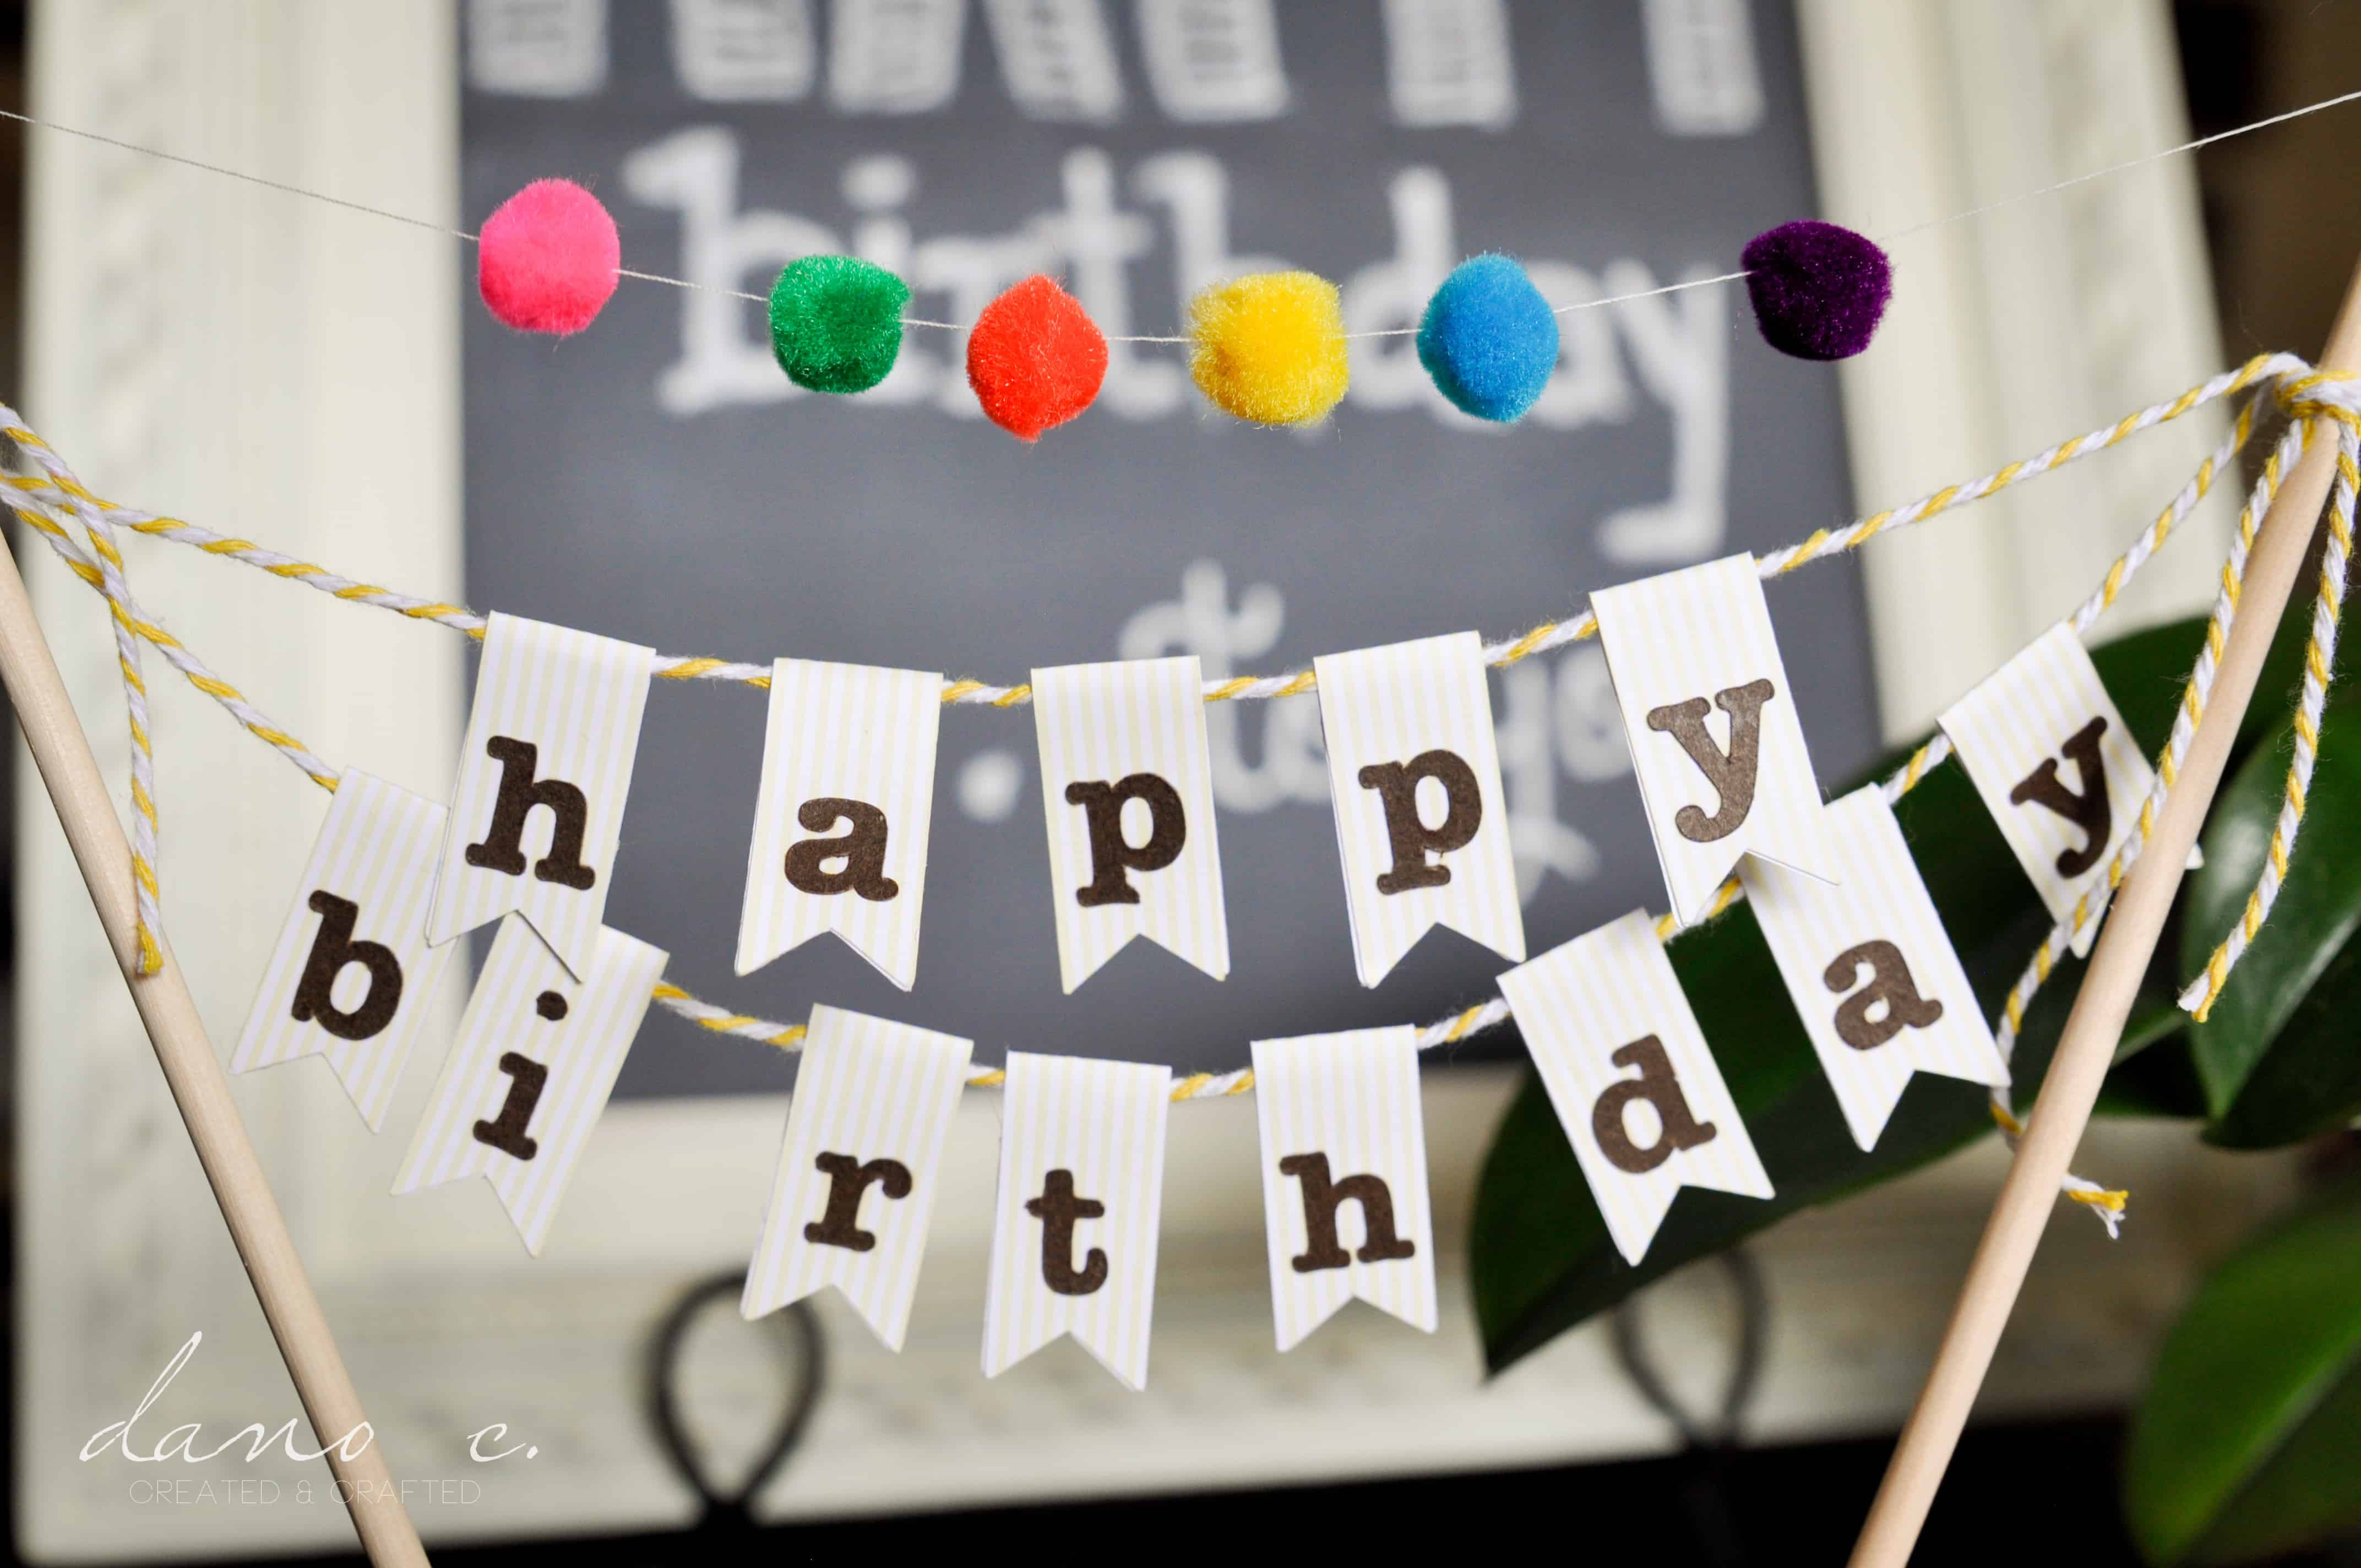 Diy birthday cake banner Sweets photos blog